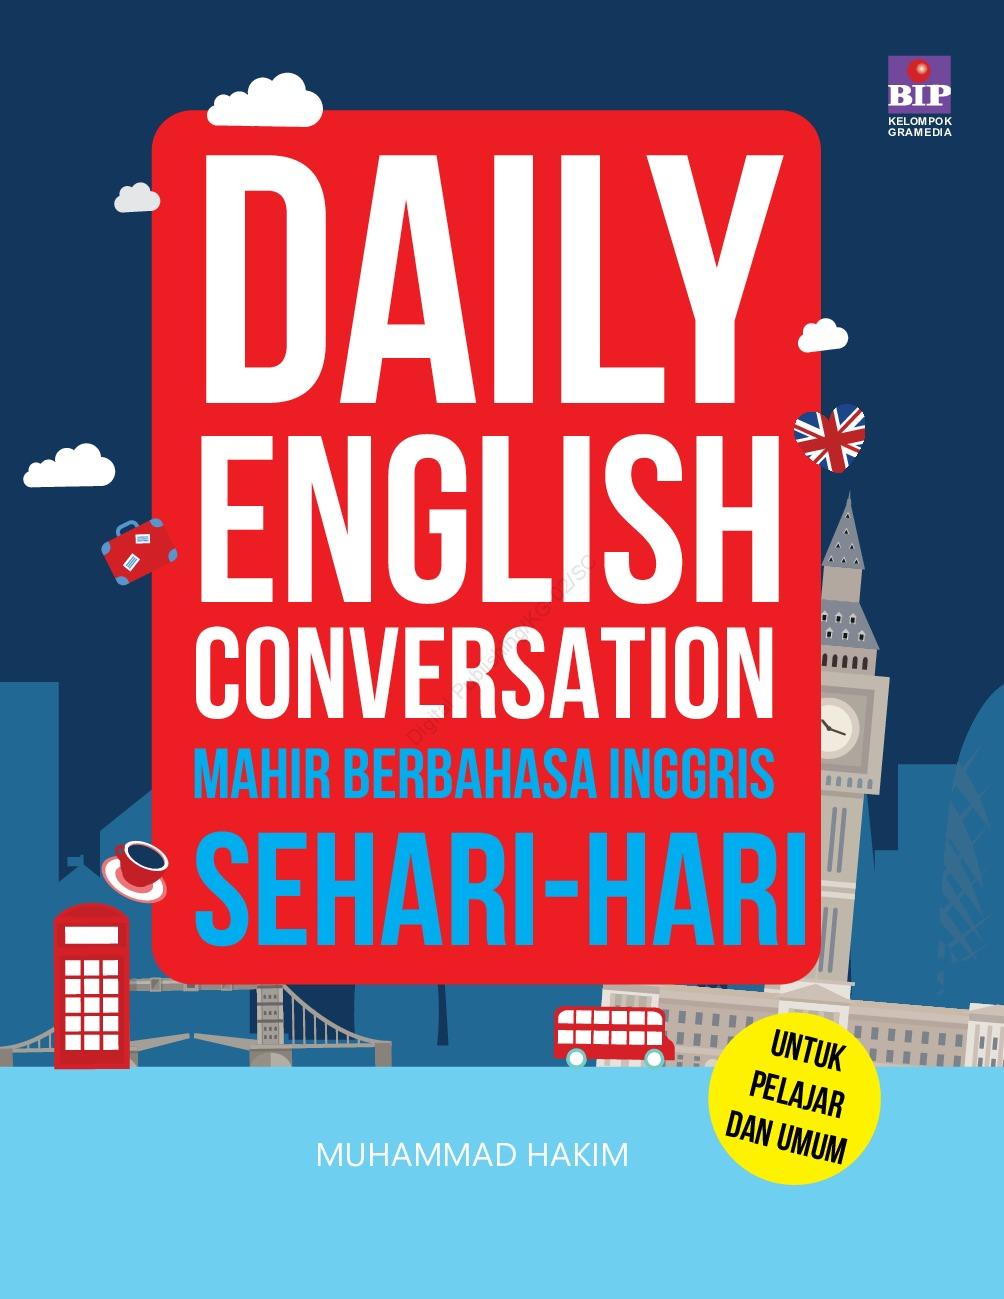 Daily English Conversation : Mahir Bahasa Inggris Sehari-Hari